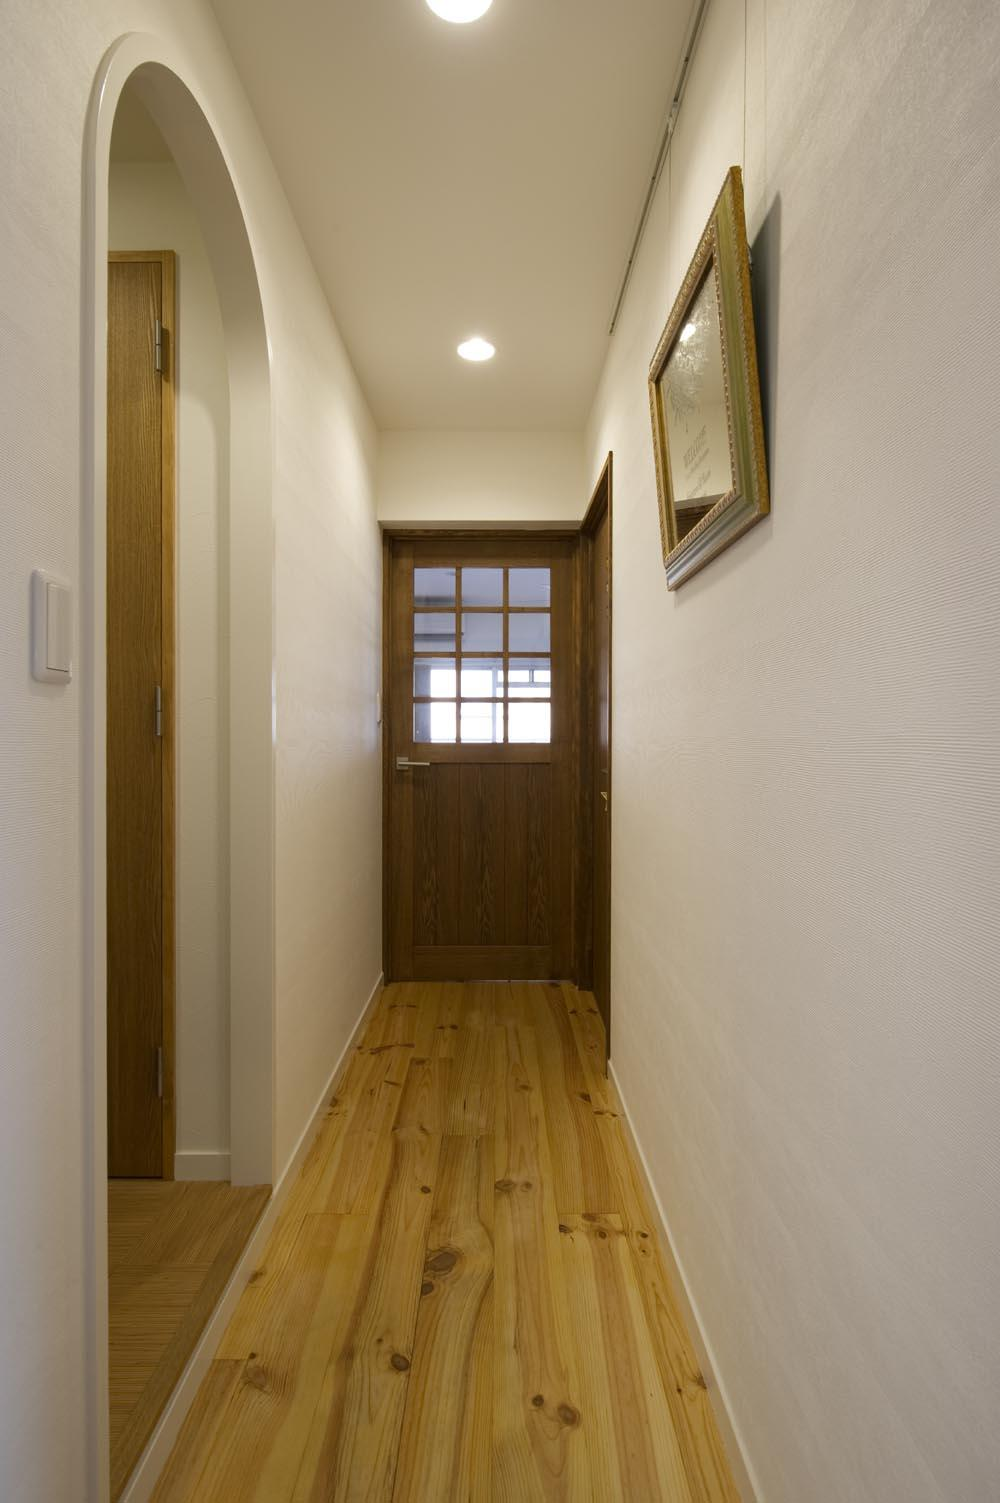 I邸・斜めに配置したキッチンで、動きと変化をの部屋 LDKにつながる廊下